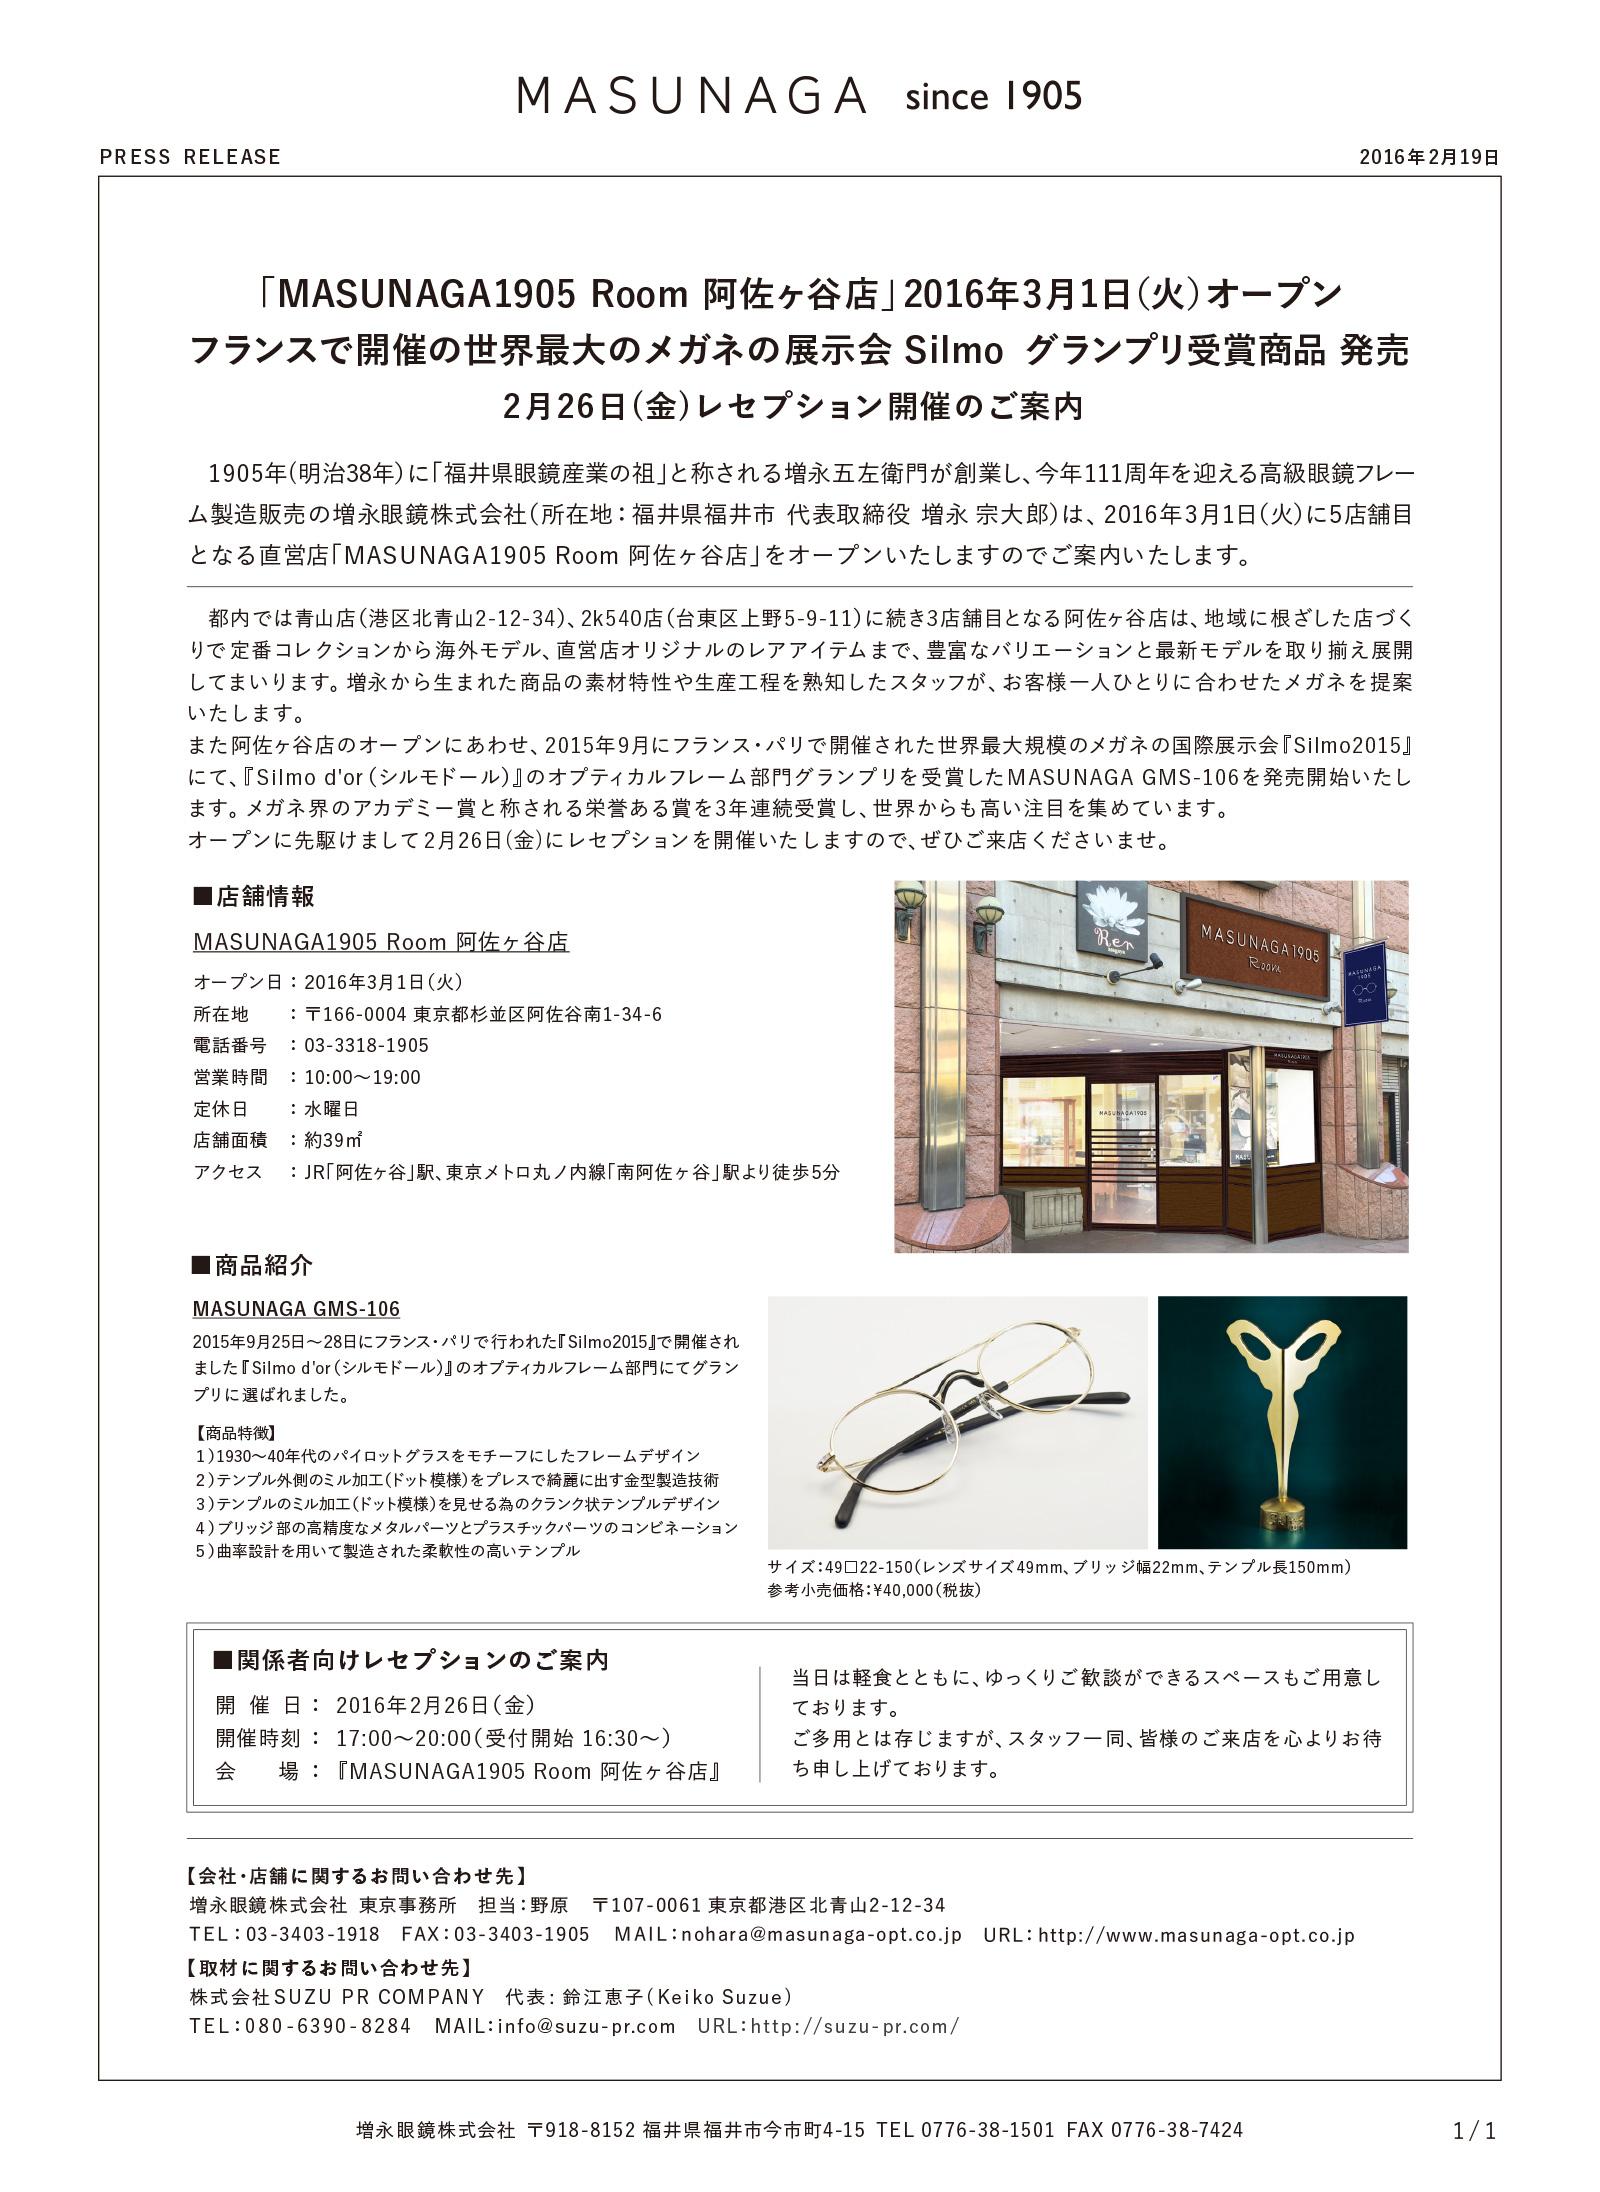 MASUNAGA1905 Room 阿佐ヶ谷店